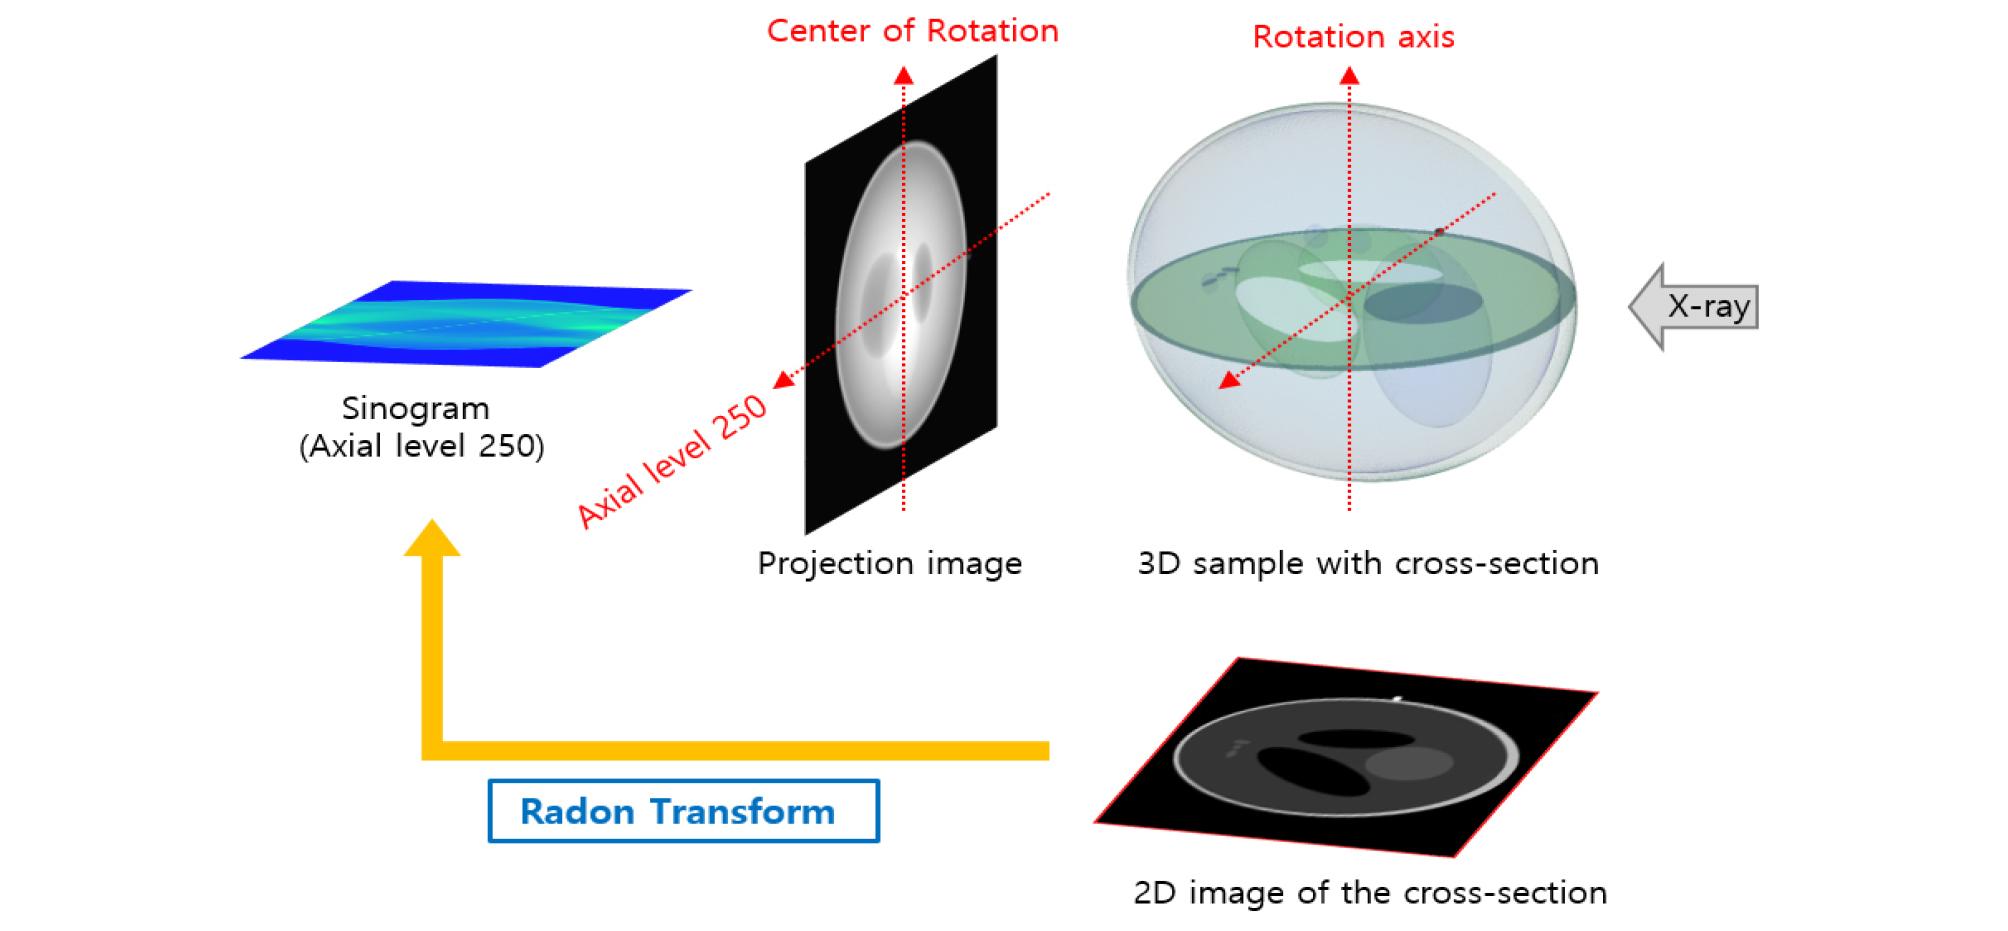 http://static.apub.kr/journalsite/sites/kaomi/2020-024-02/N0880240201/images/kaomi_24_02_01_F1.jpg